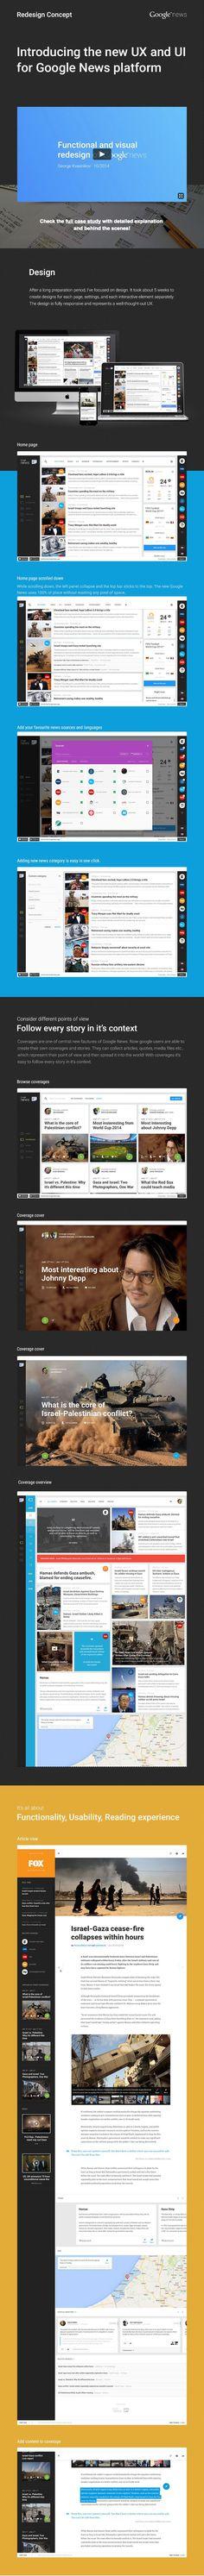 Google News - George Kvasnikov - Designer